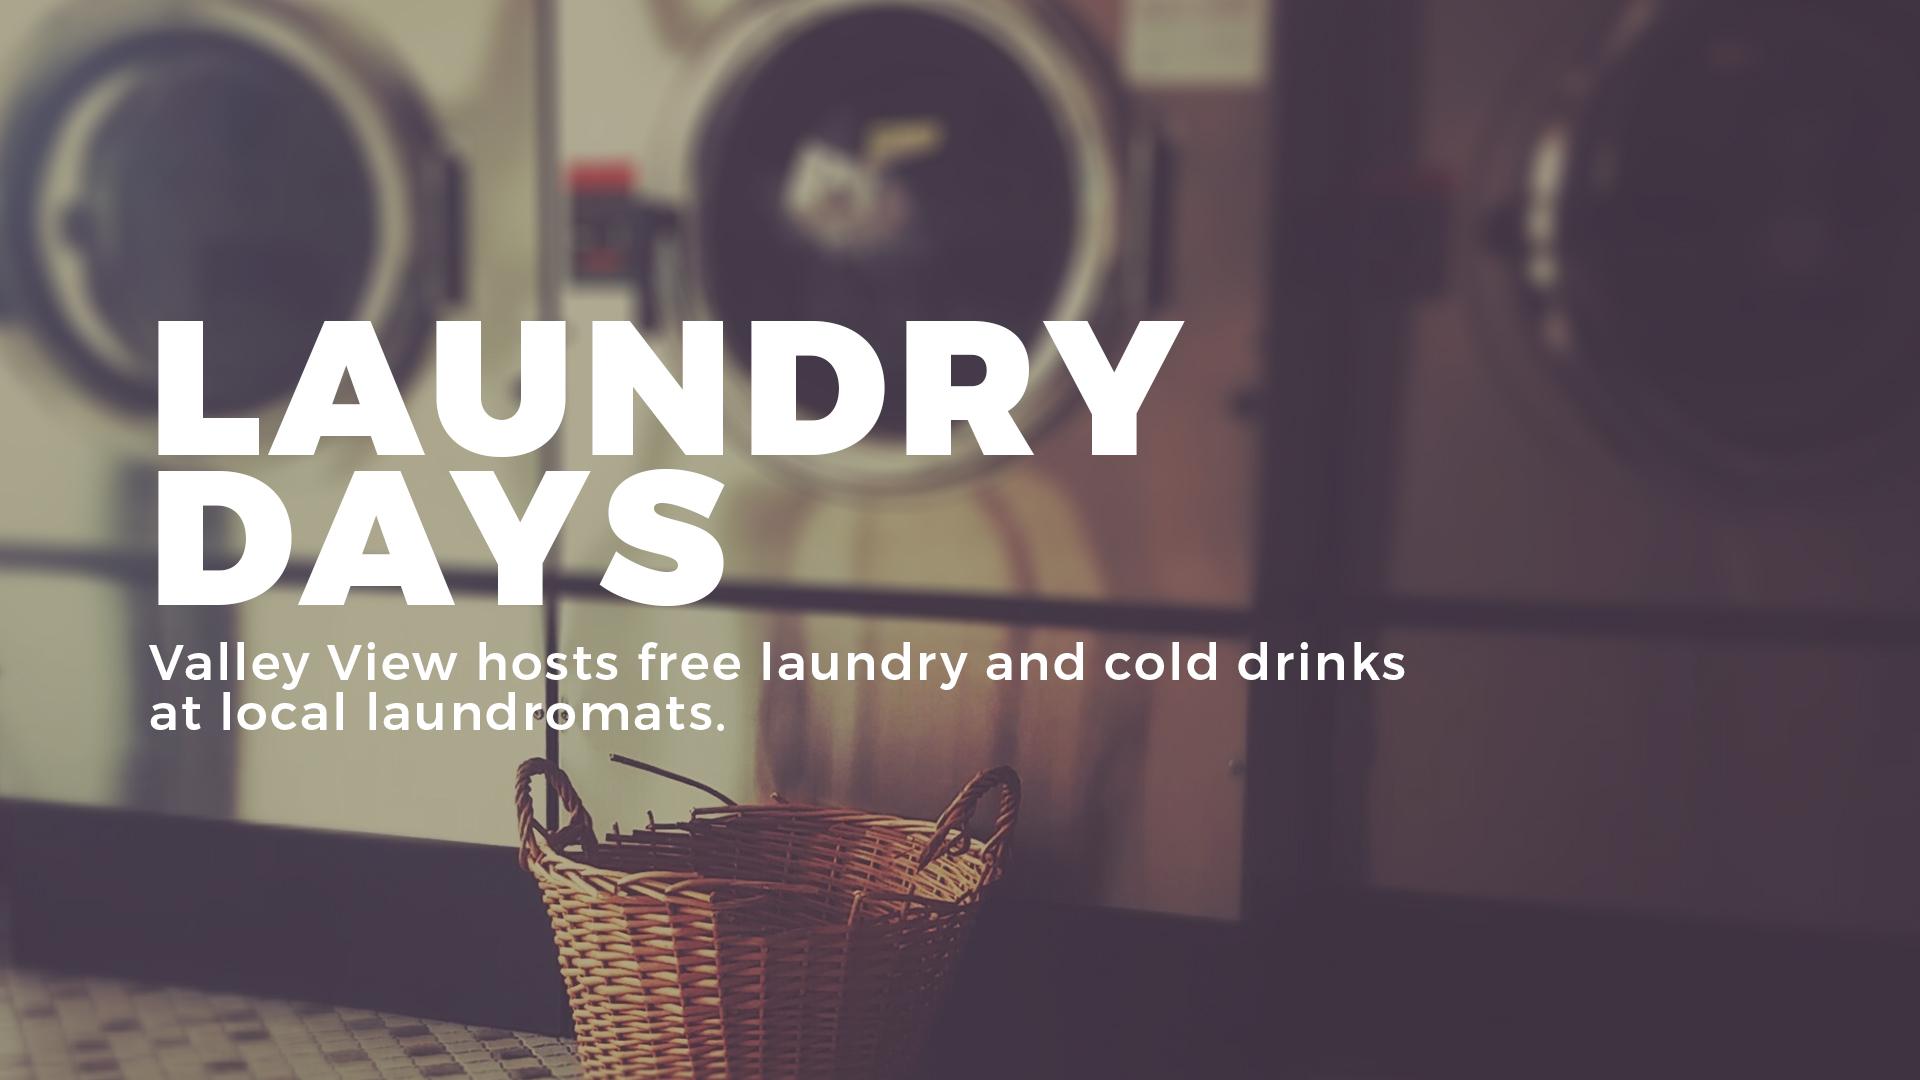 laundry days dallas